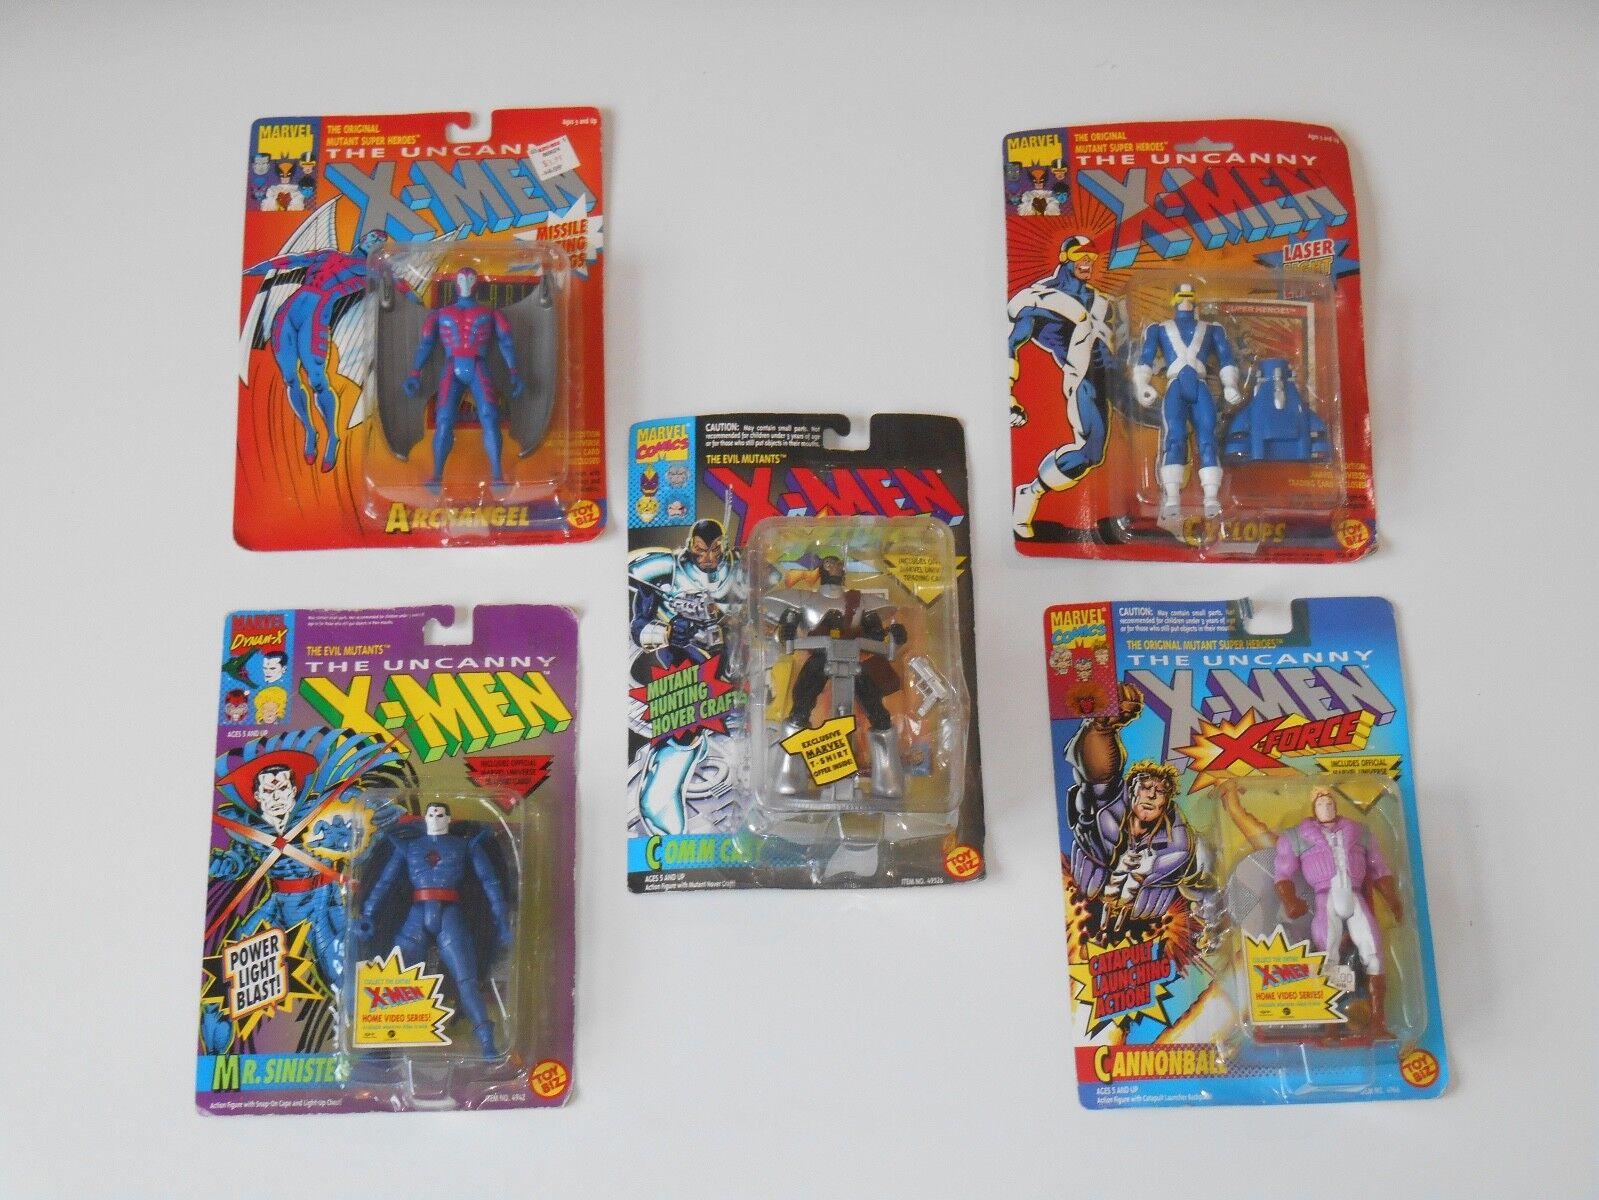 Ein neues spielzeug - biz marvel - comics  x - men  zyklopen erzengel herr finstere figur viel